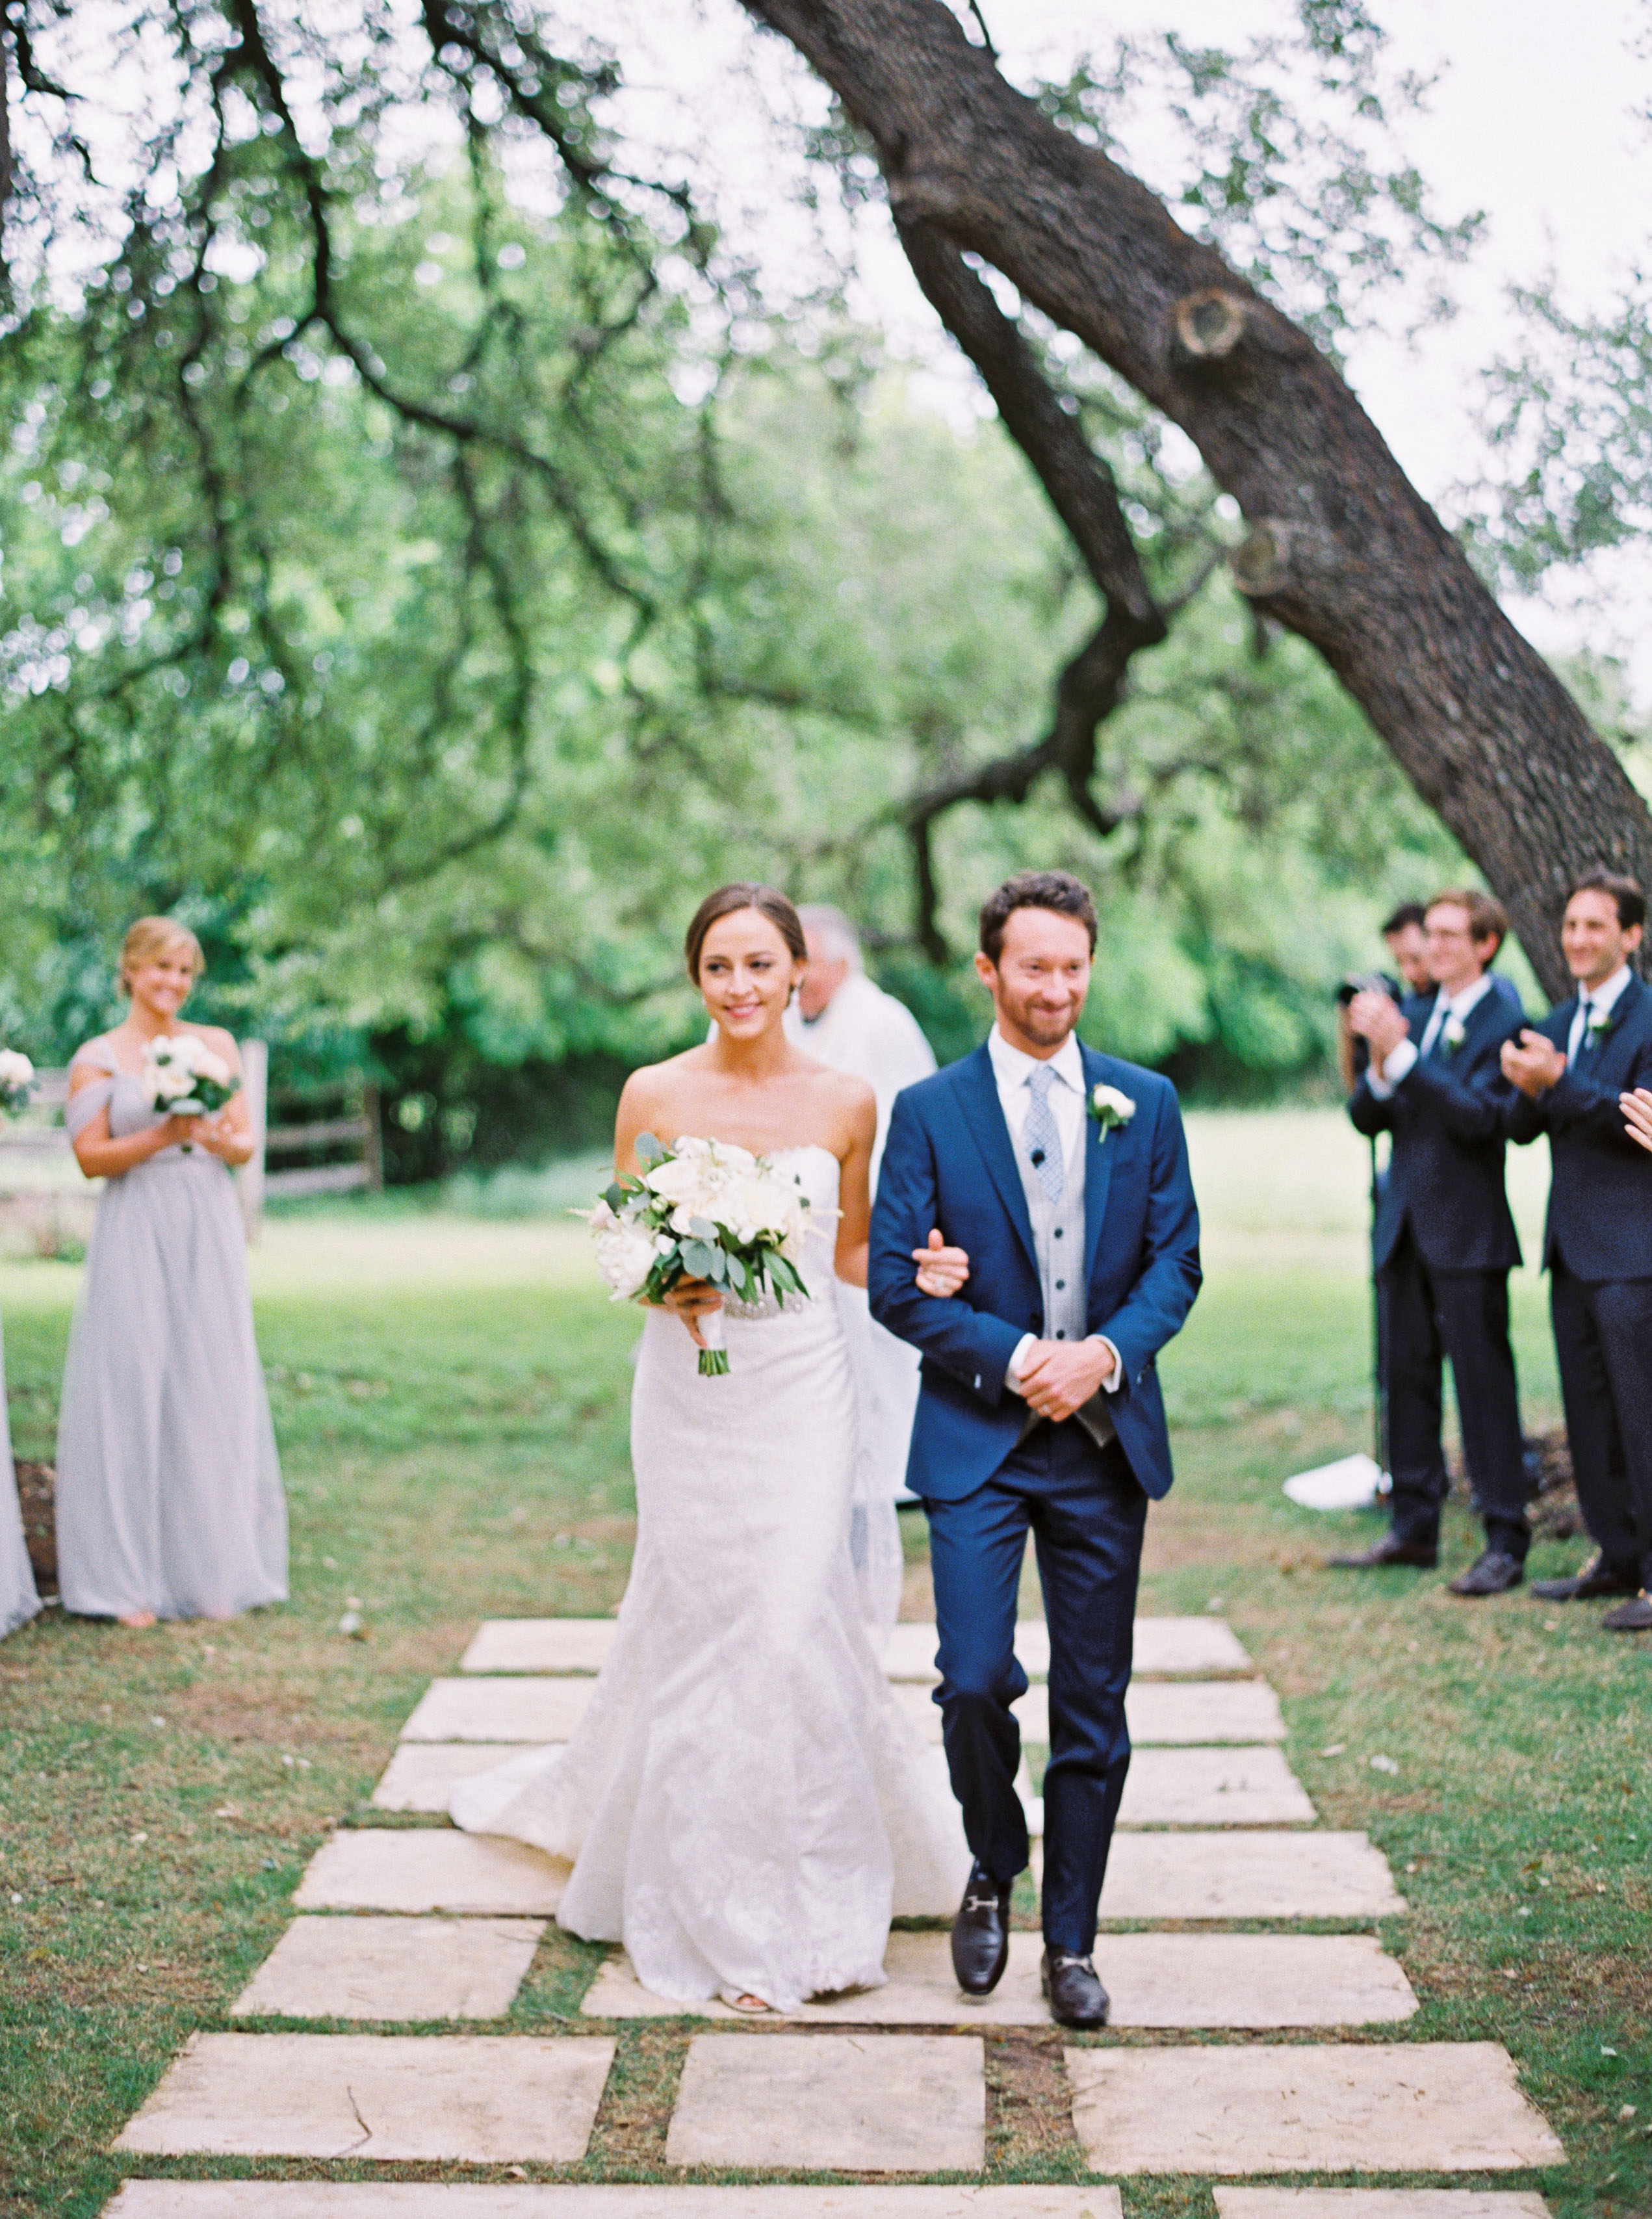 spring wedding recessional bride and groom